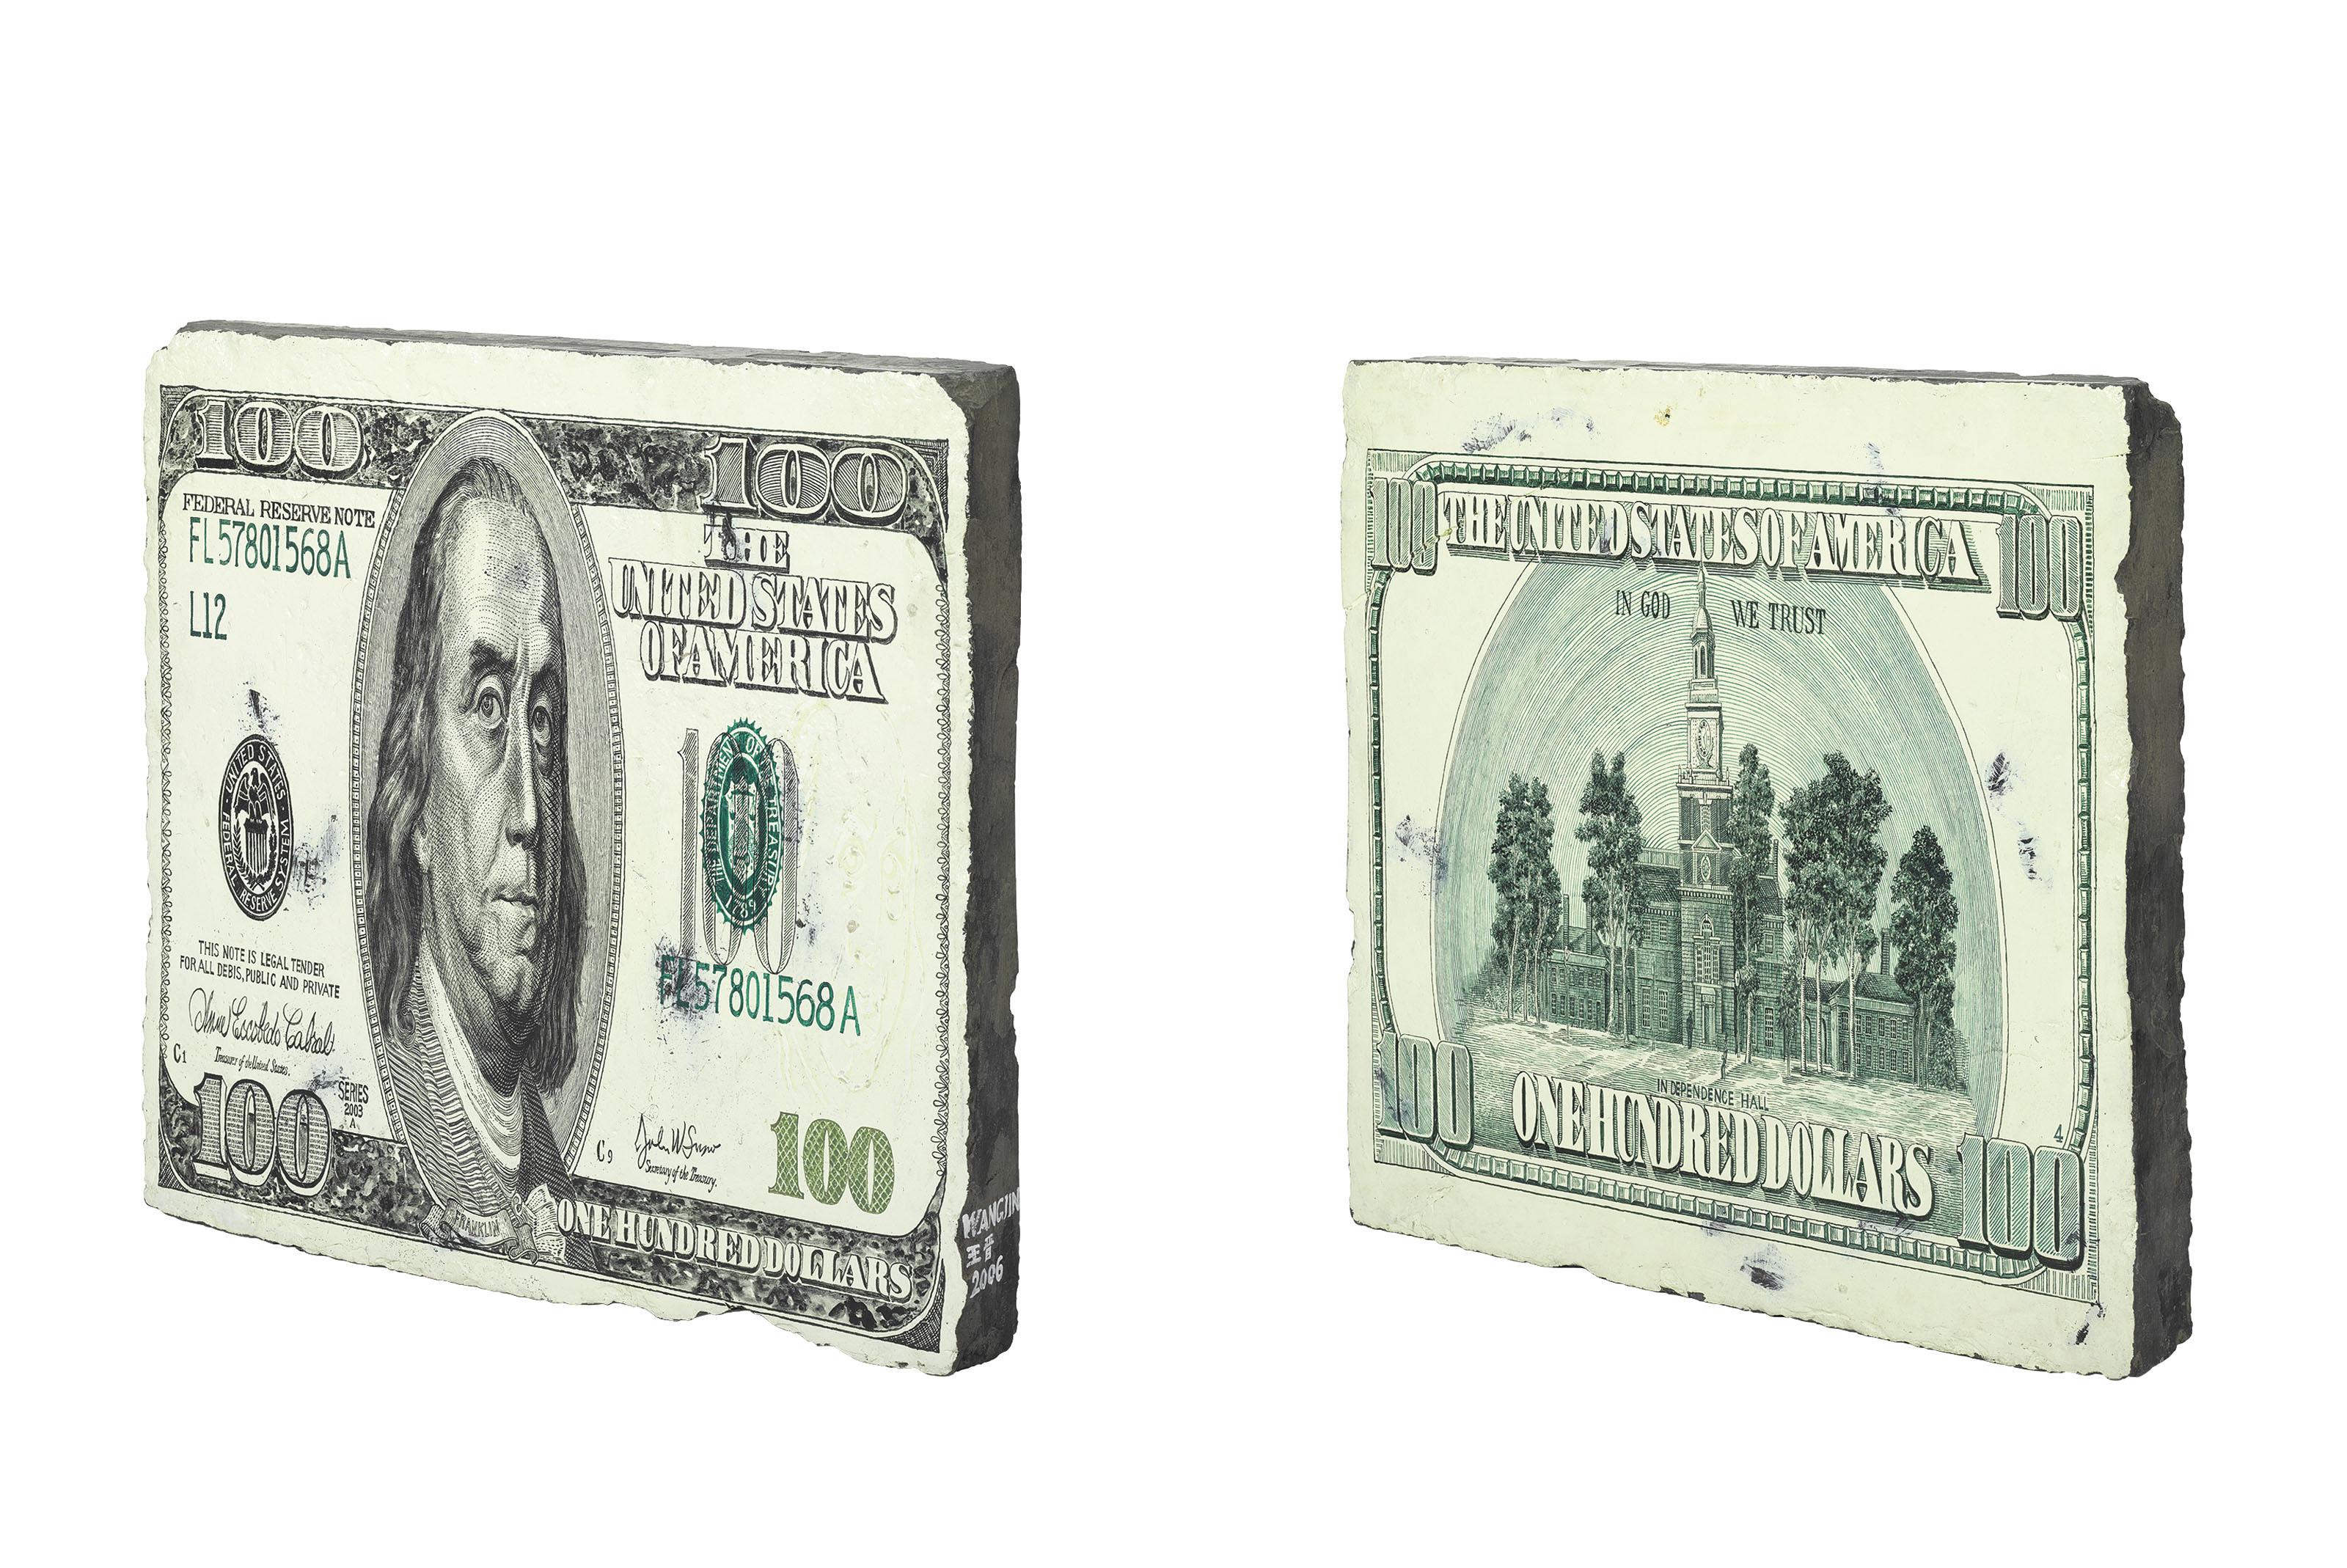 US$100